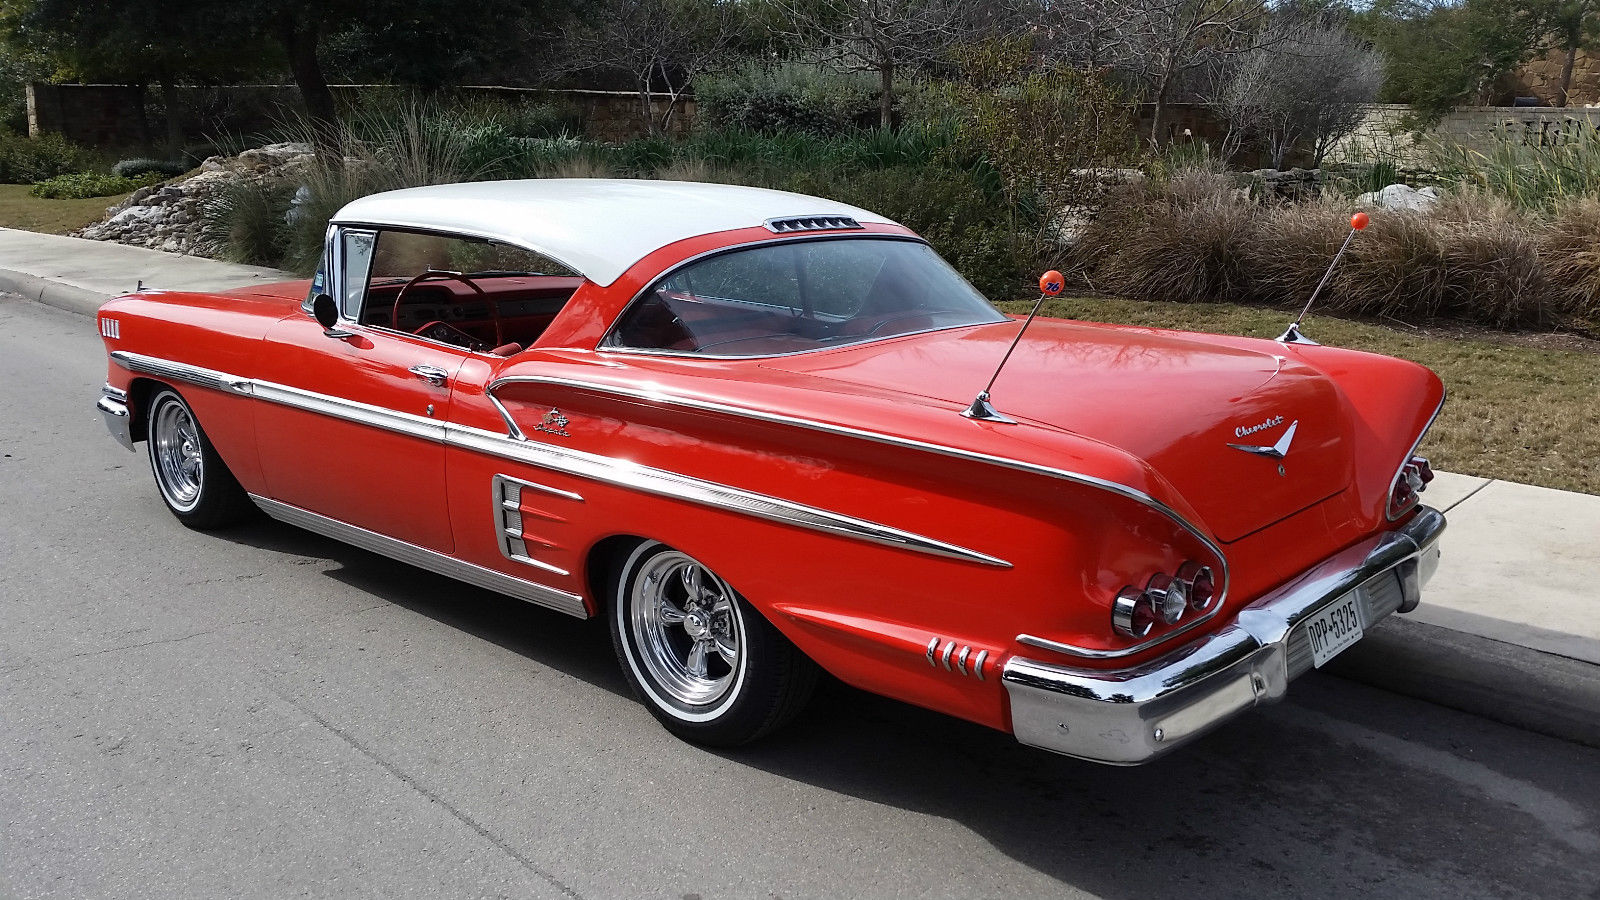 1958 Chevy Impala Sport Coupe 2 Door Hardtop 327 Sb 4